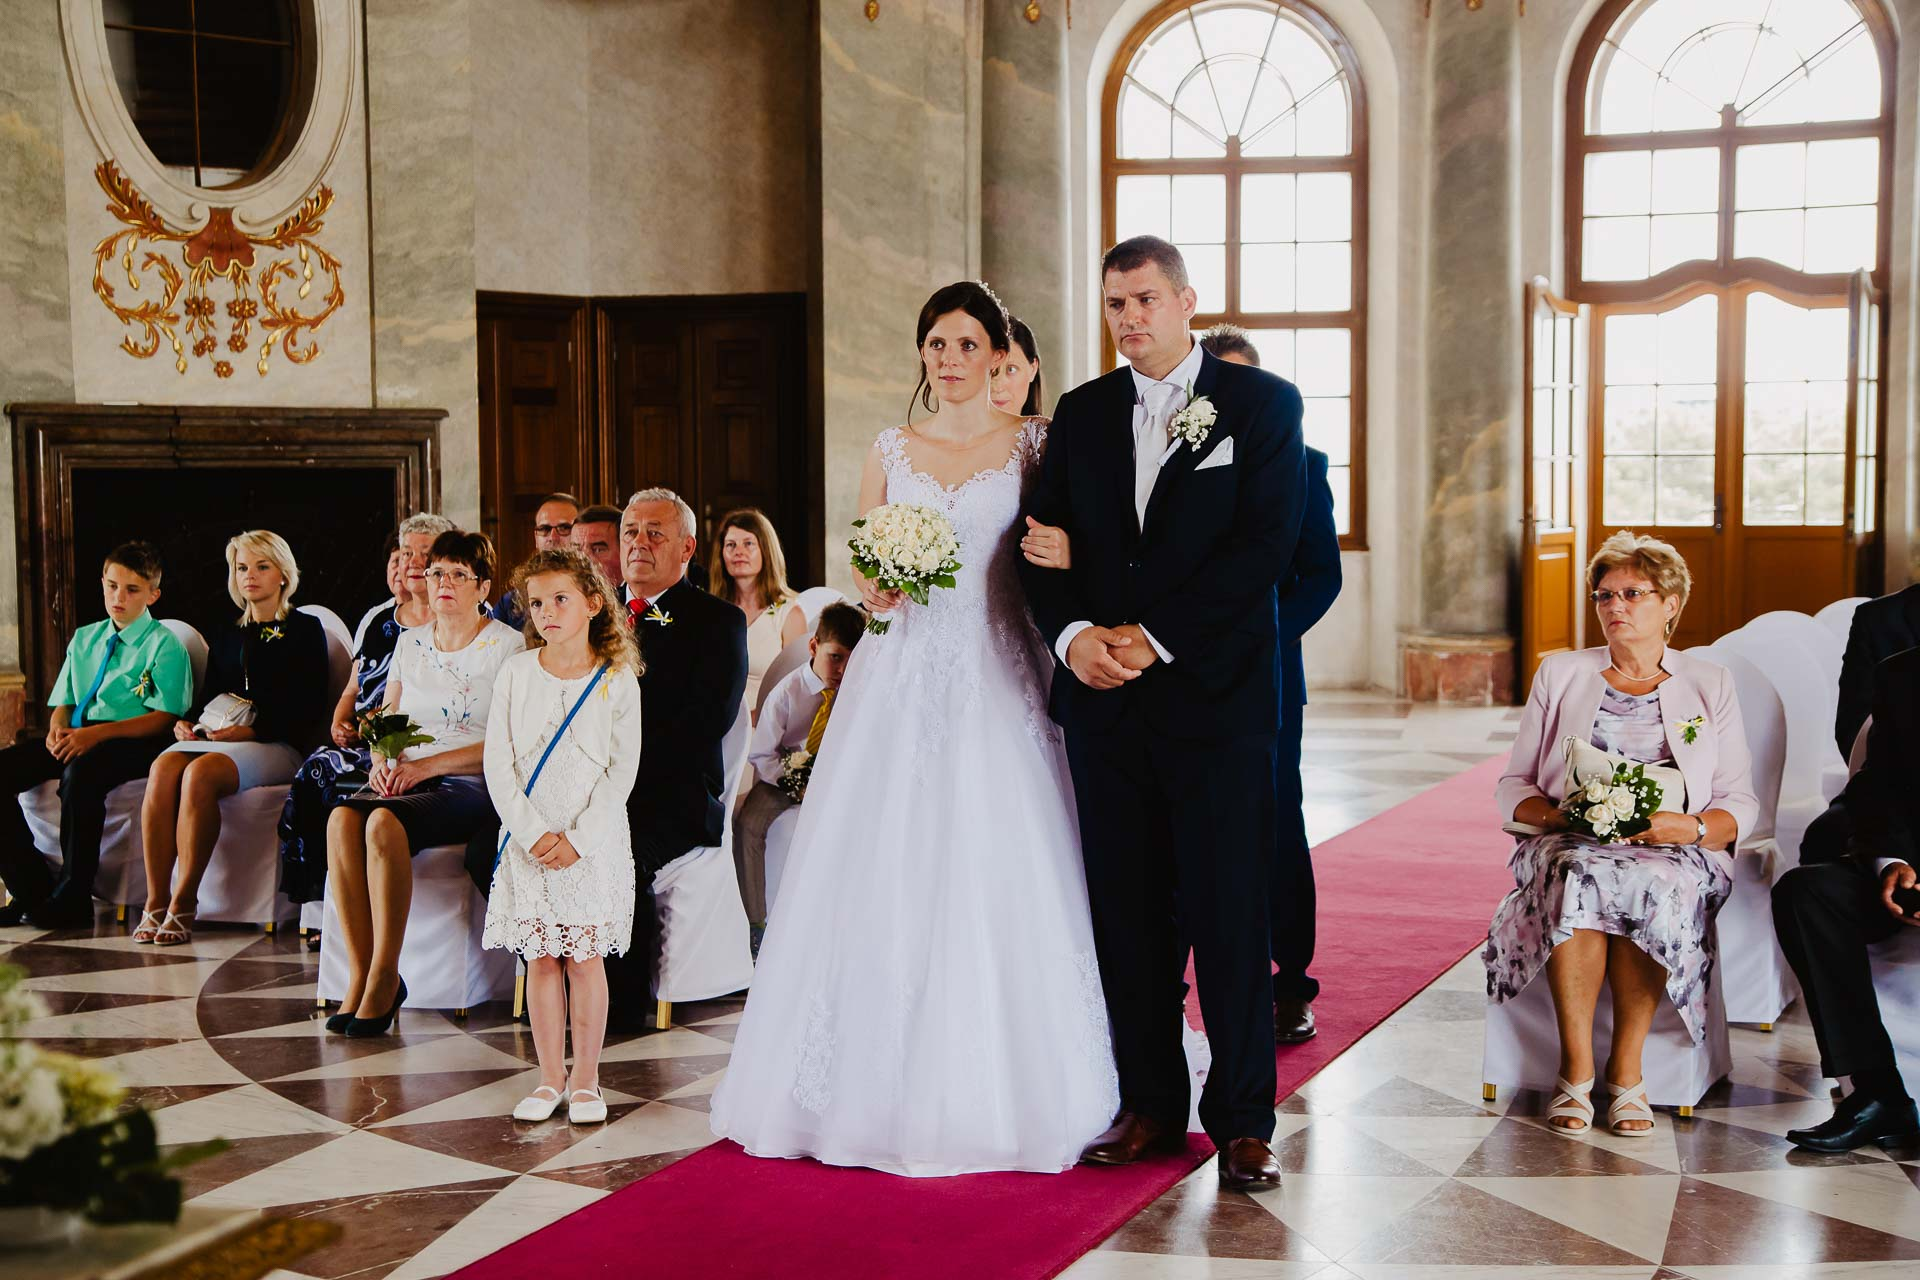 Svatební-fotograf-zámek-Karlova-Koruna-Chlumec-nad-Cidlinou-33